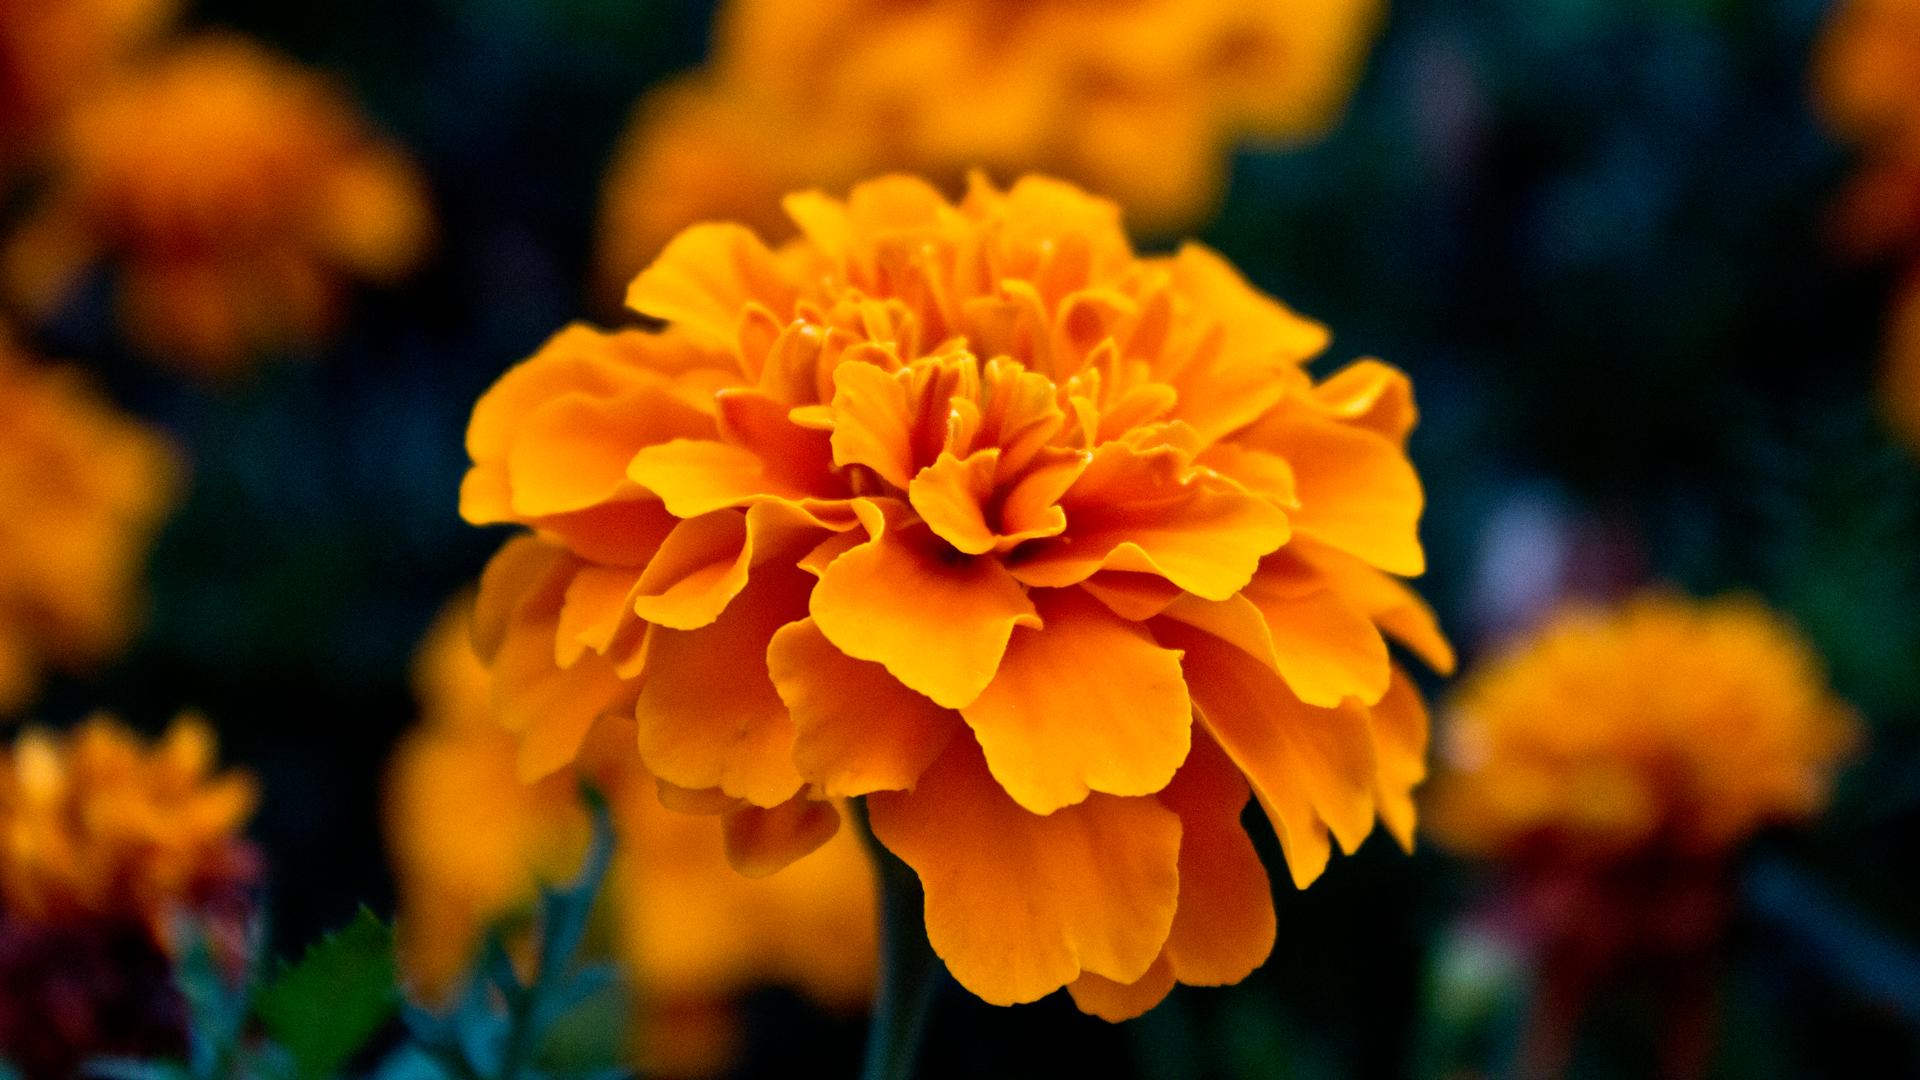 Amazing Orange Flowers